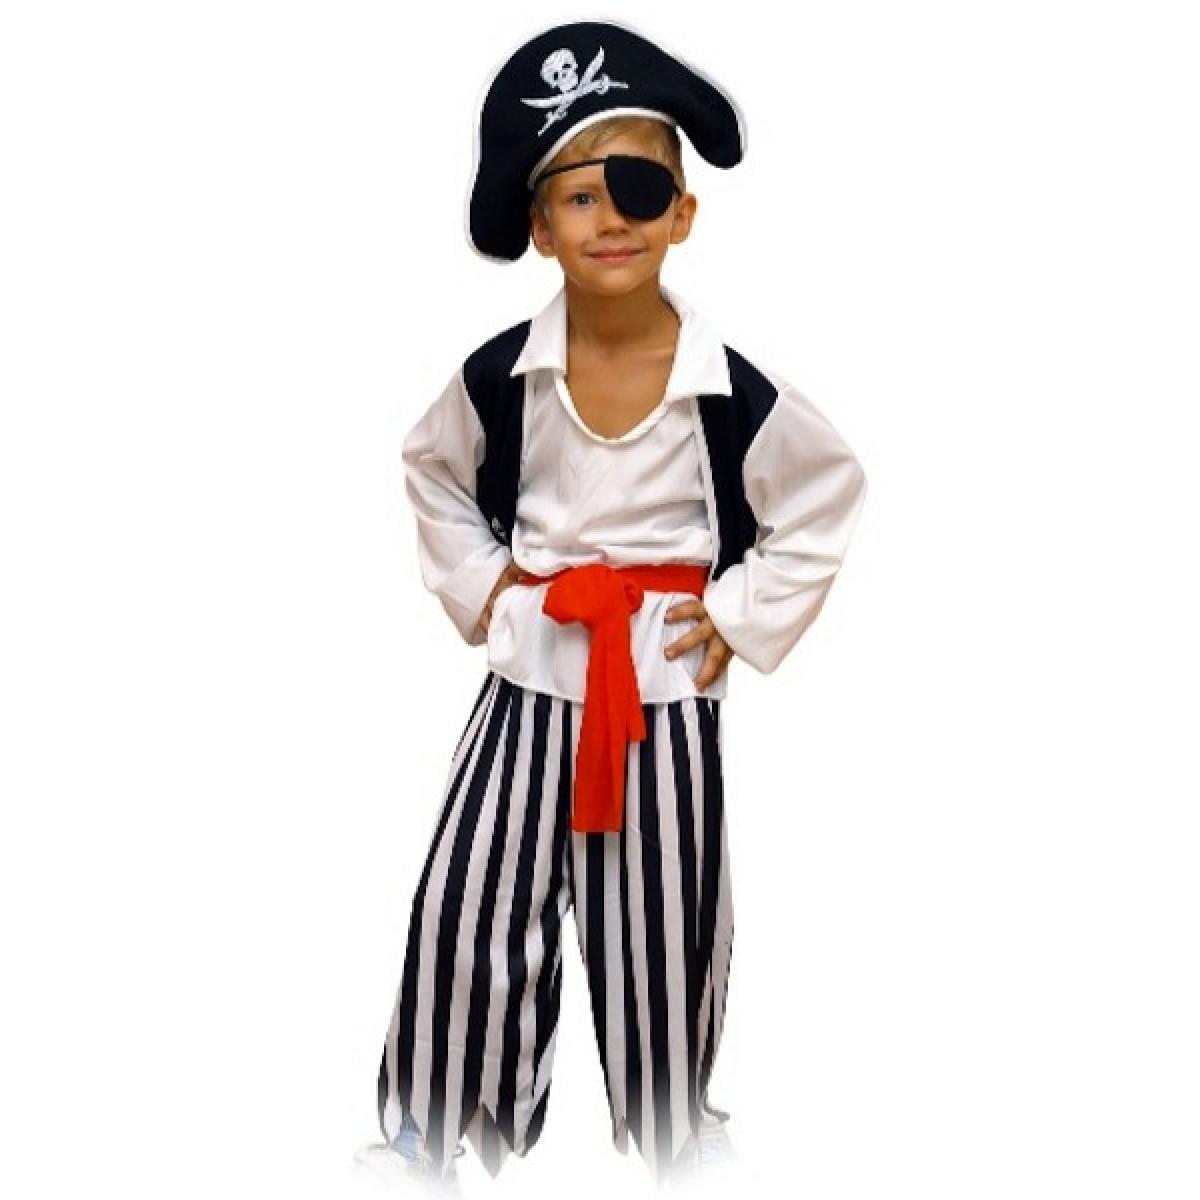 разбойника мальчику костюма фото